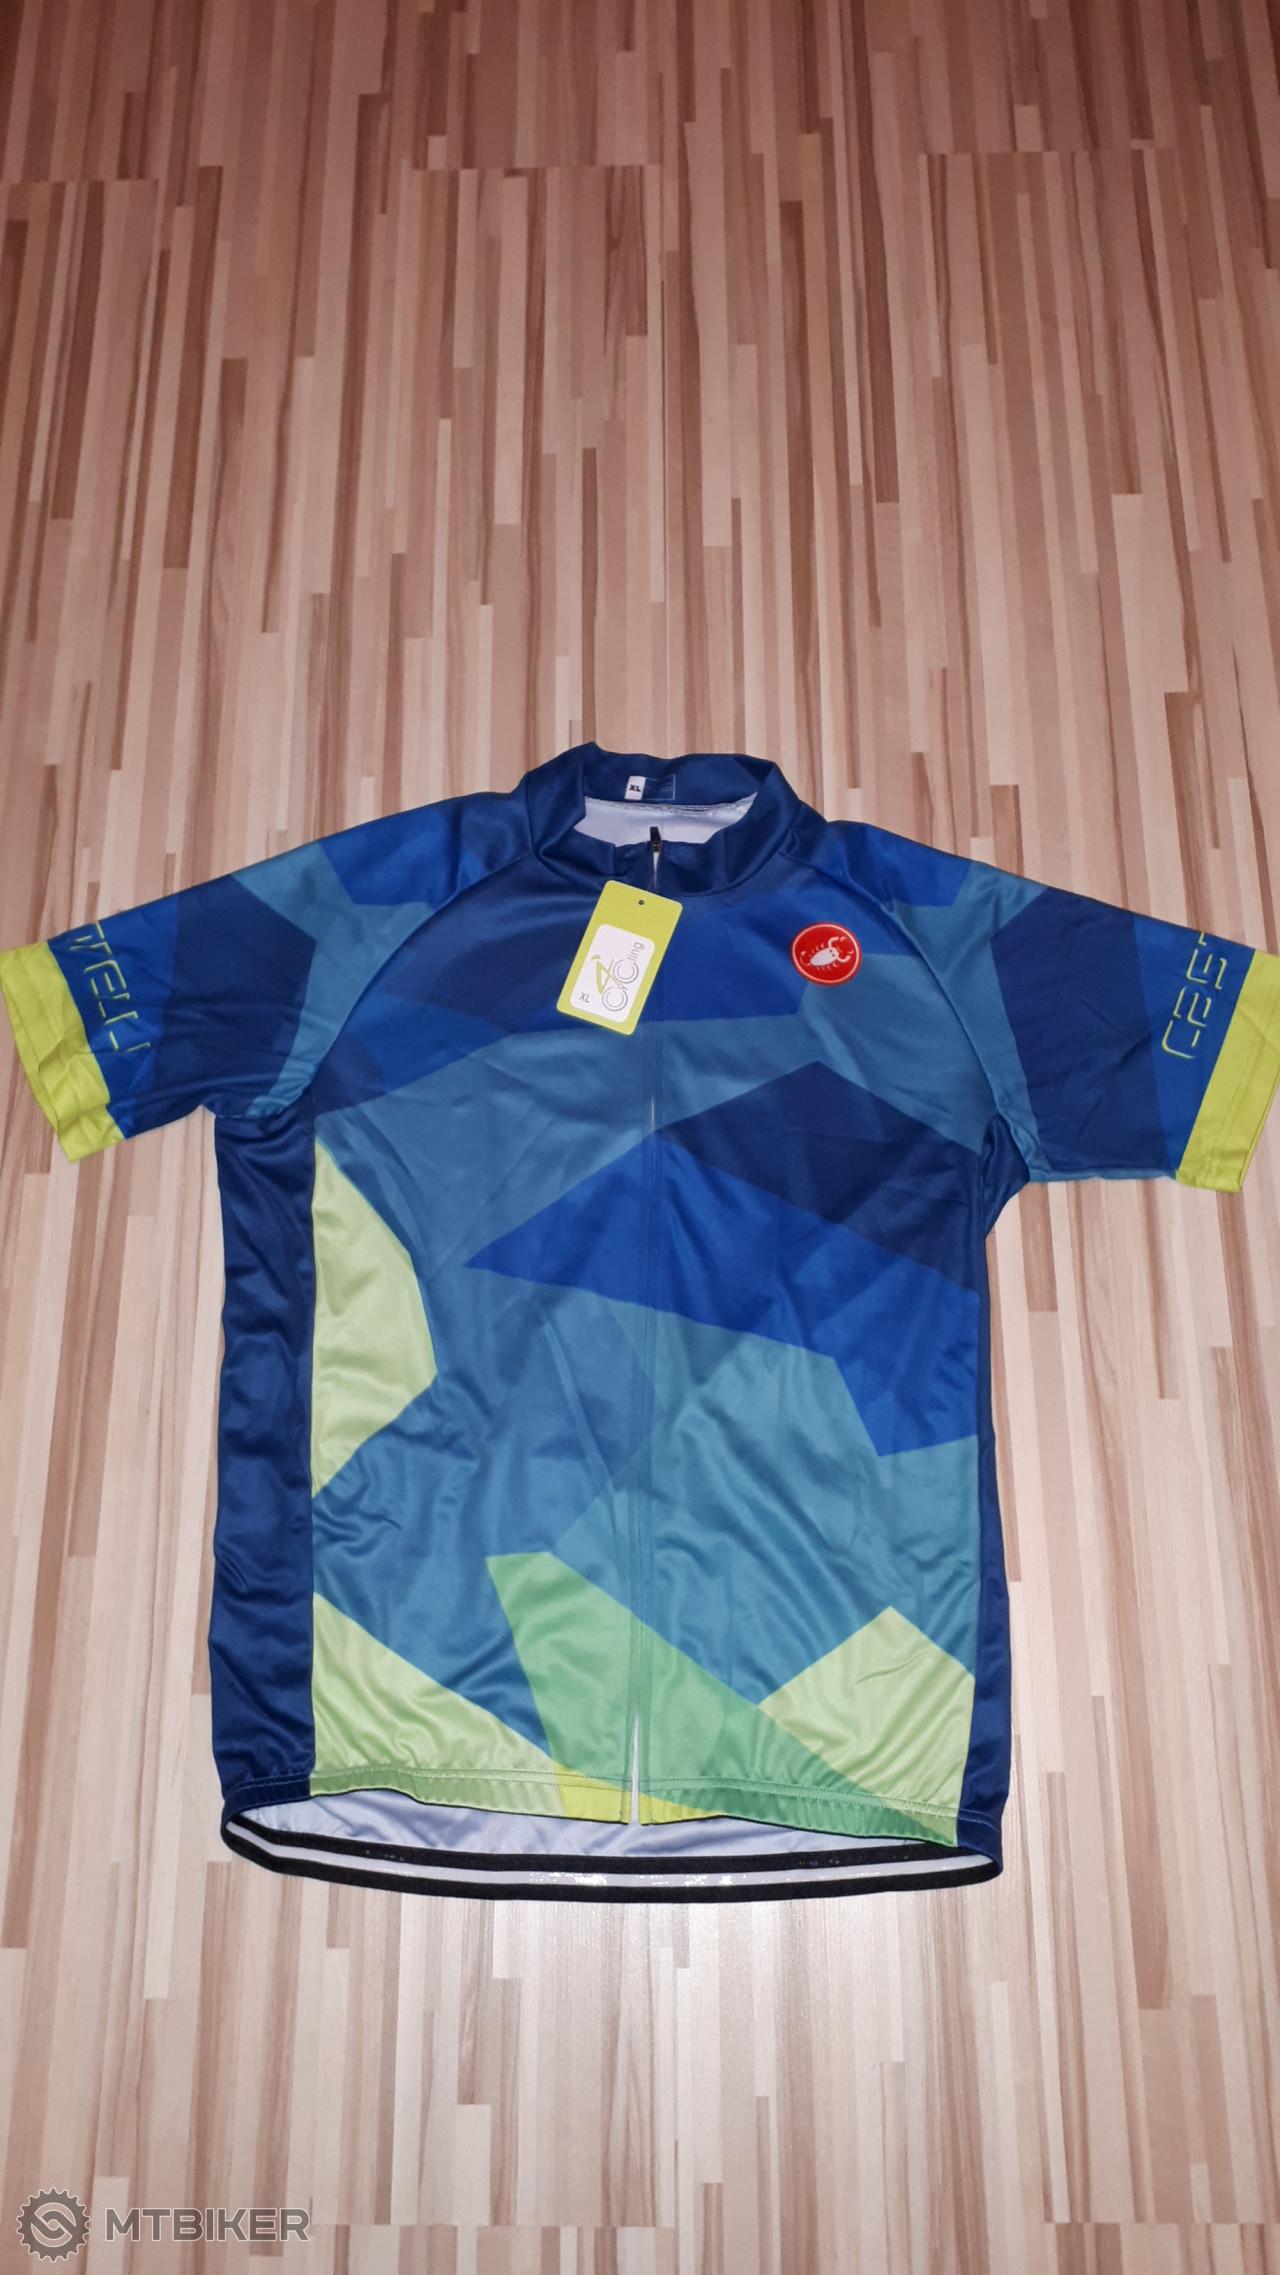 57f75a3d06ce2 Castelli - Príslušenstvo - Oblečenie a batohy - Bazár MTBIKER